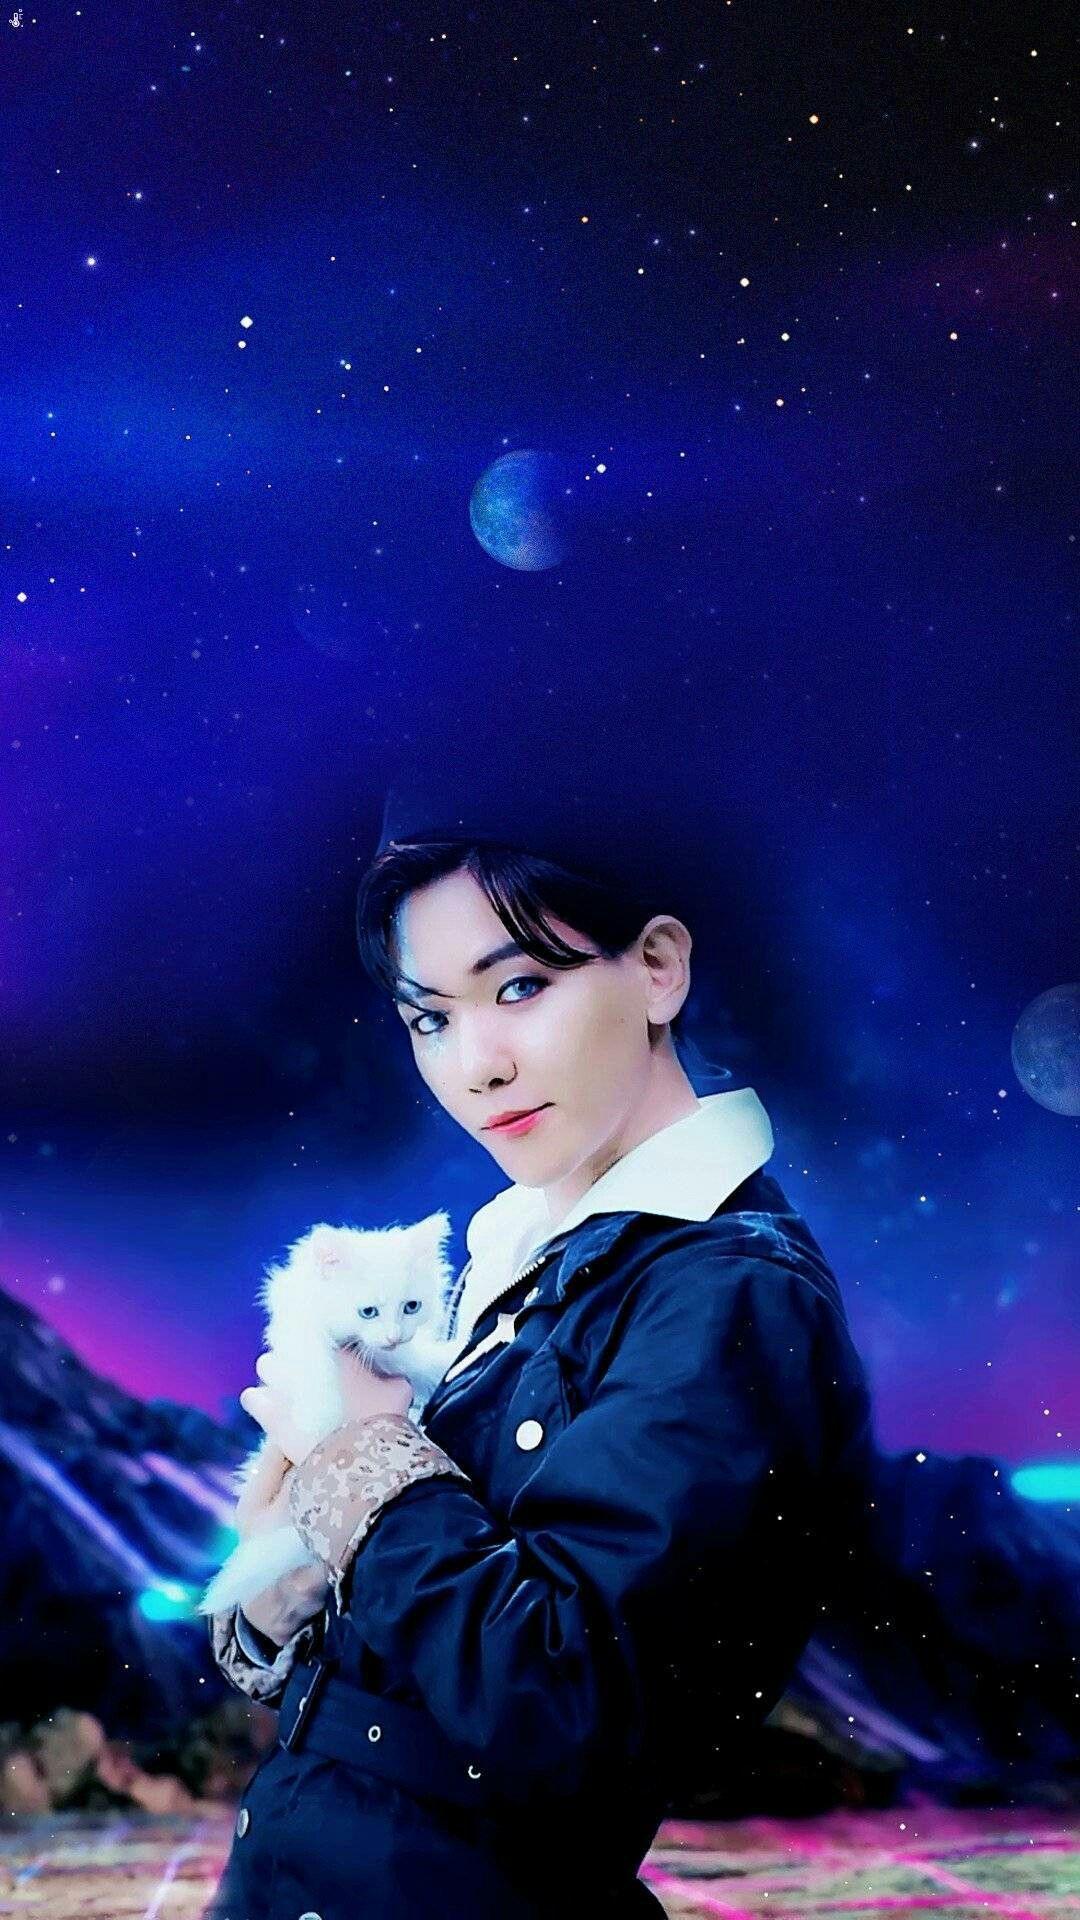 Baekhyun Wallpaper - Exo Power , HD Wallpaper & Backgrounds